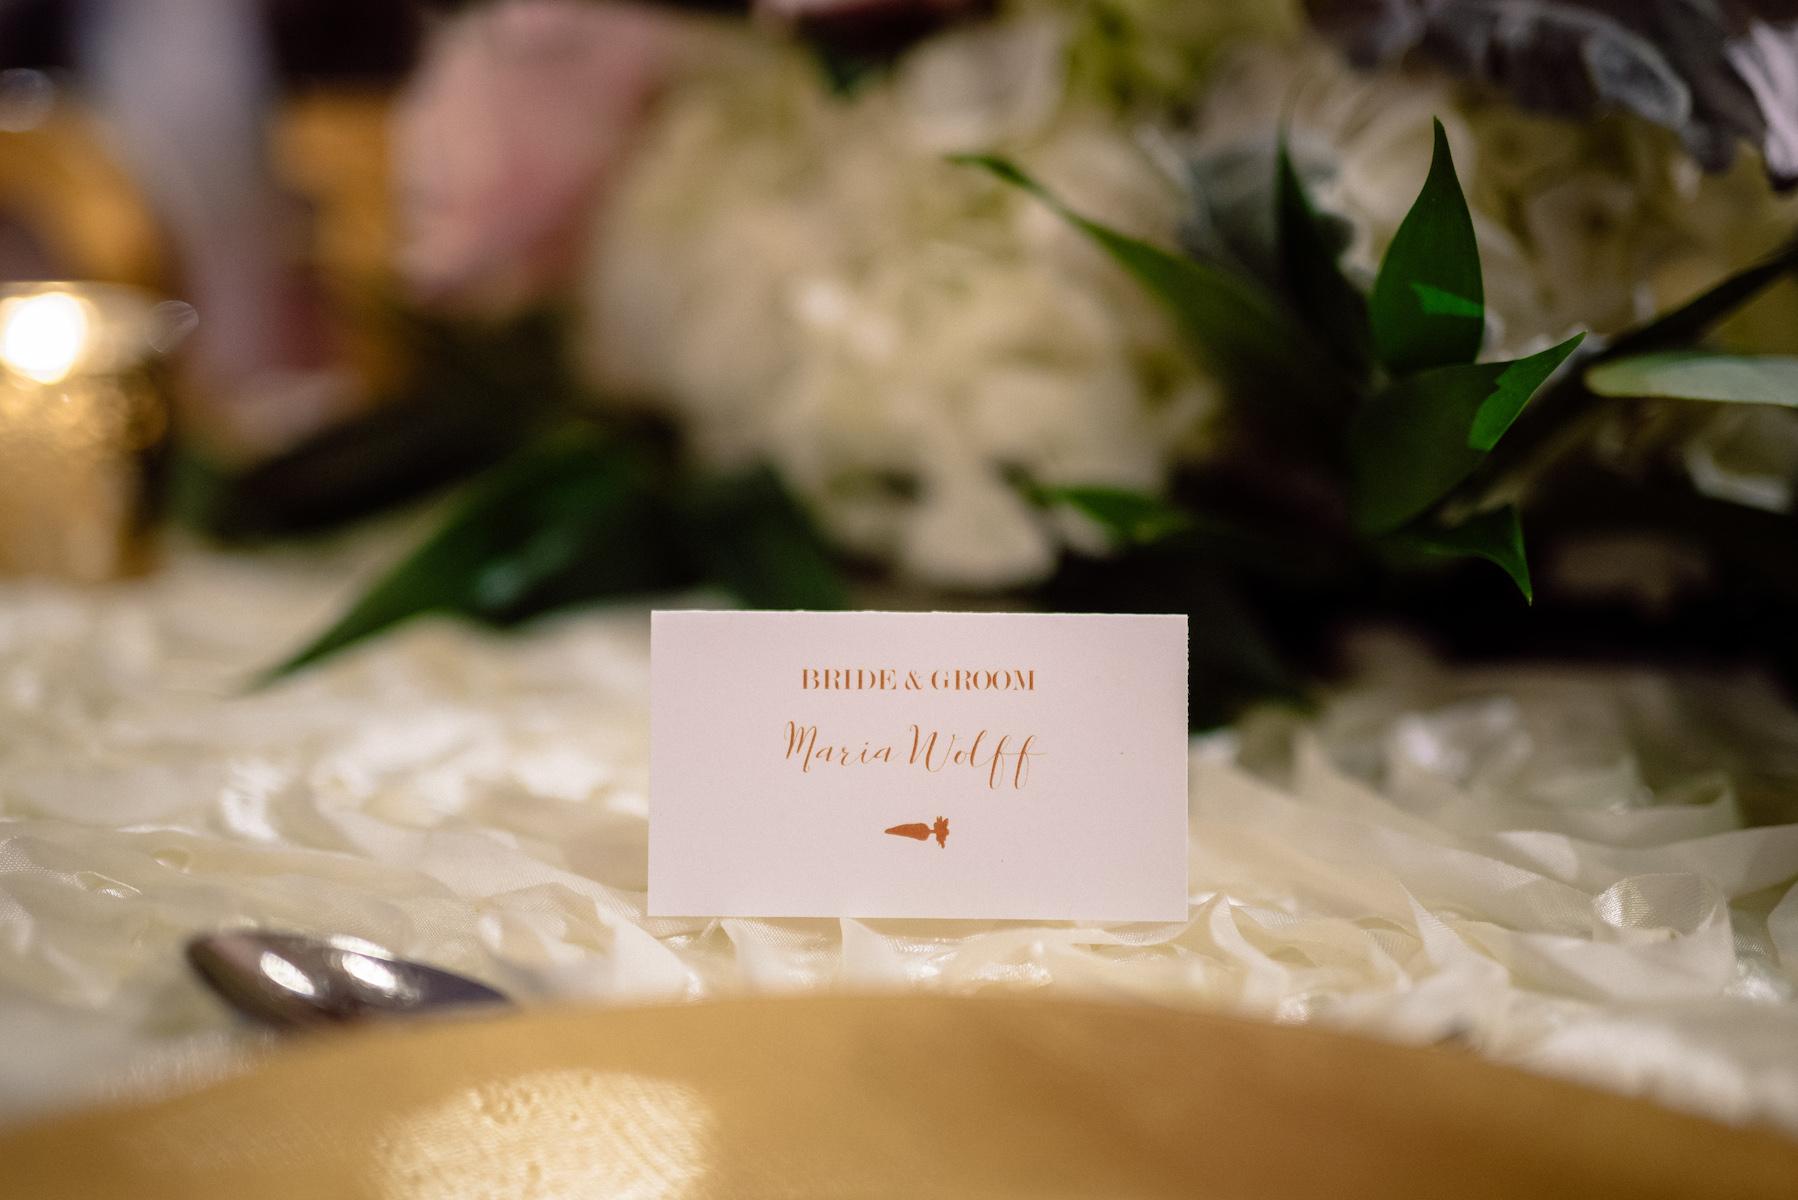 Escort Card White Gold Wedding Reception Naples Florida Matt Steeves.jpg